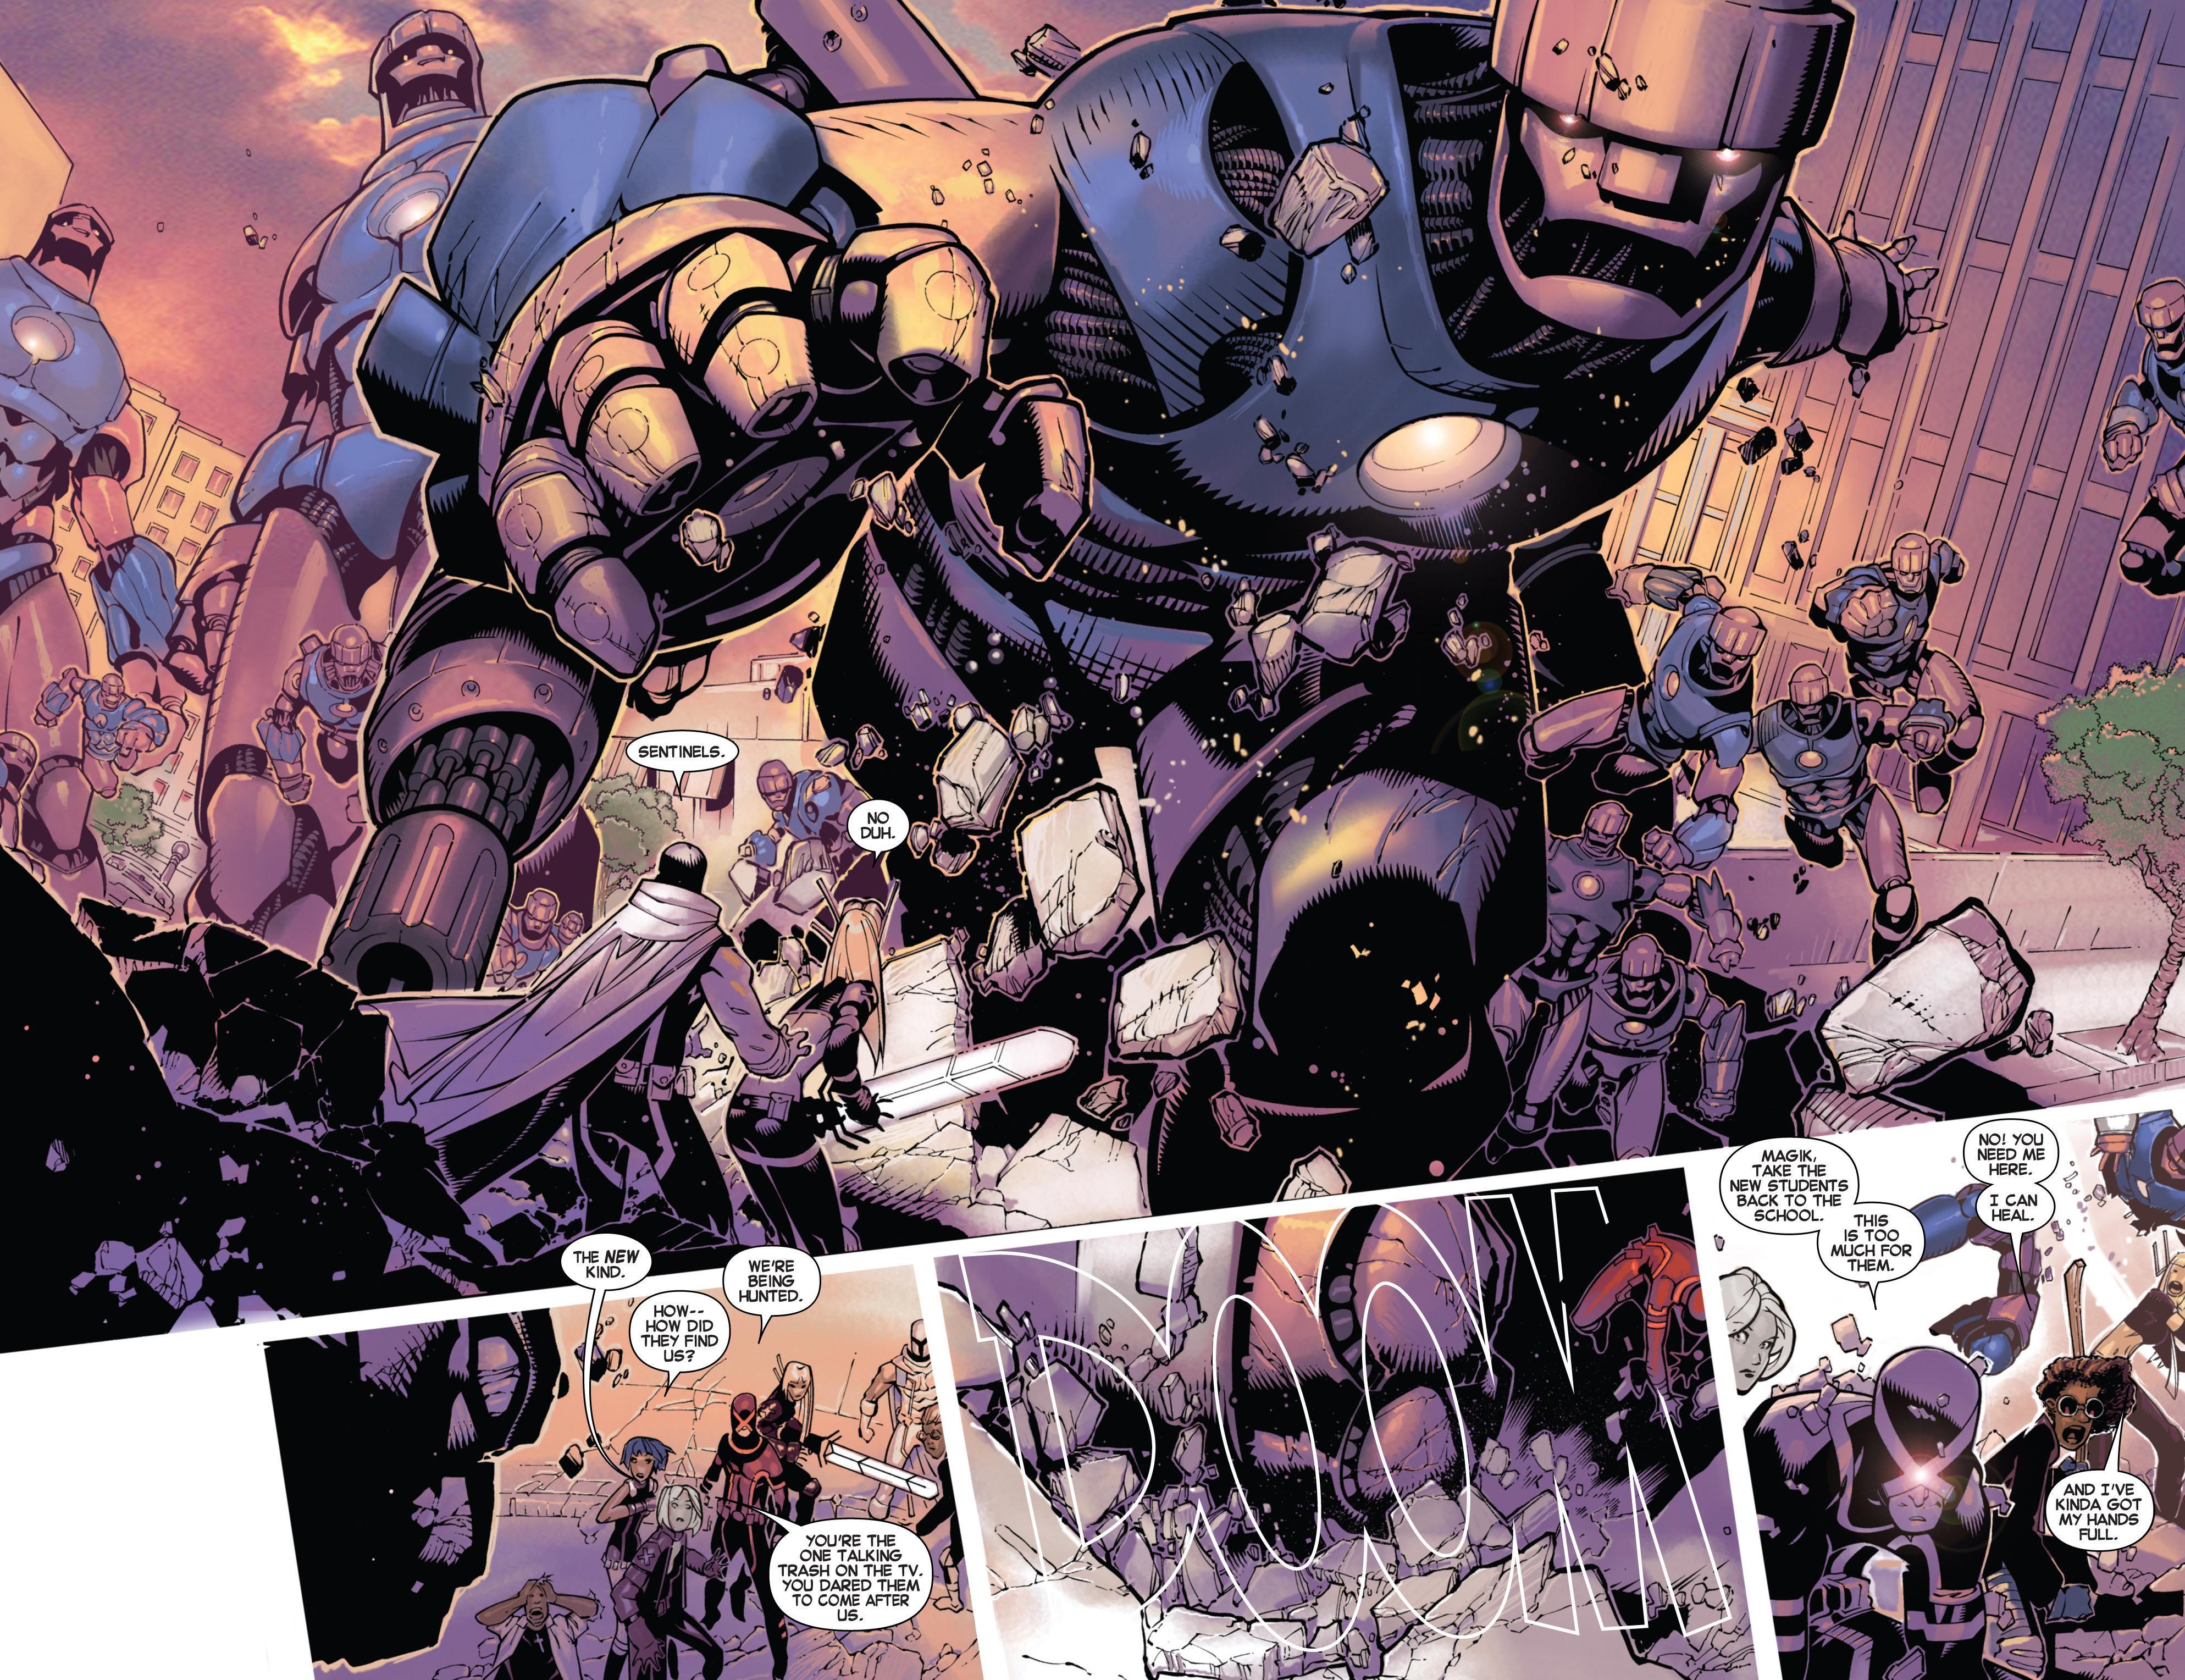 Read online Uncanny X-Men (2013) comic -  Issue # _TPB 1 - Revolution - 15